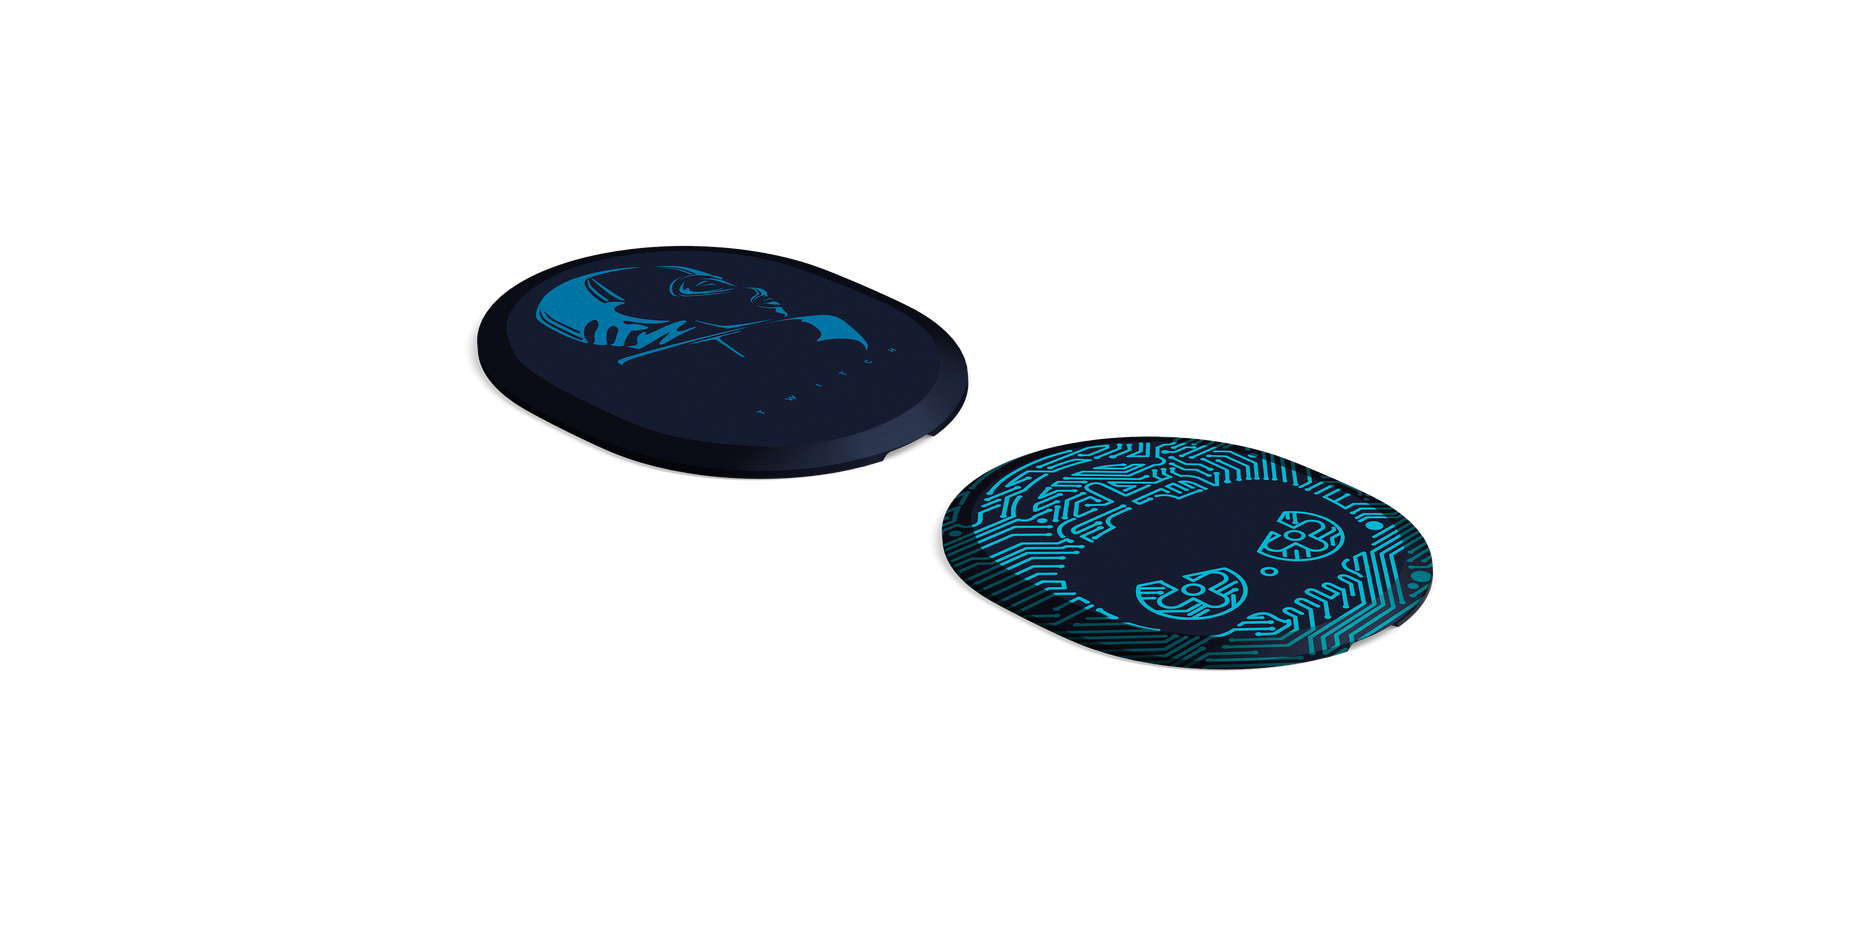 Speaker plates rendered laying flat